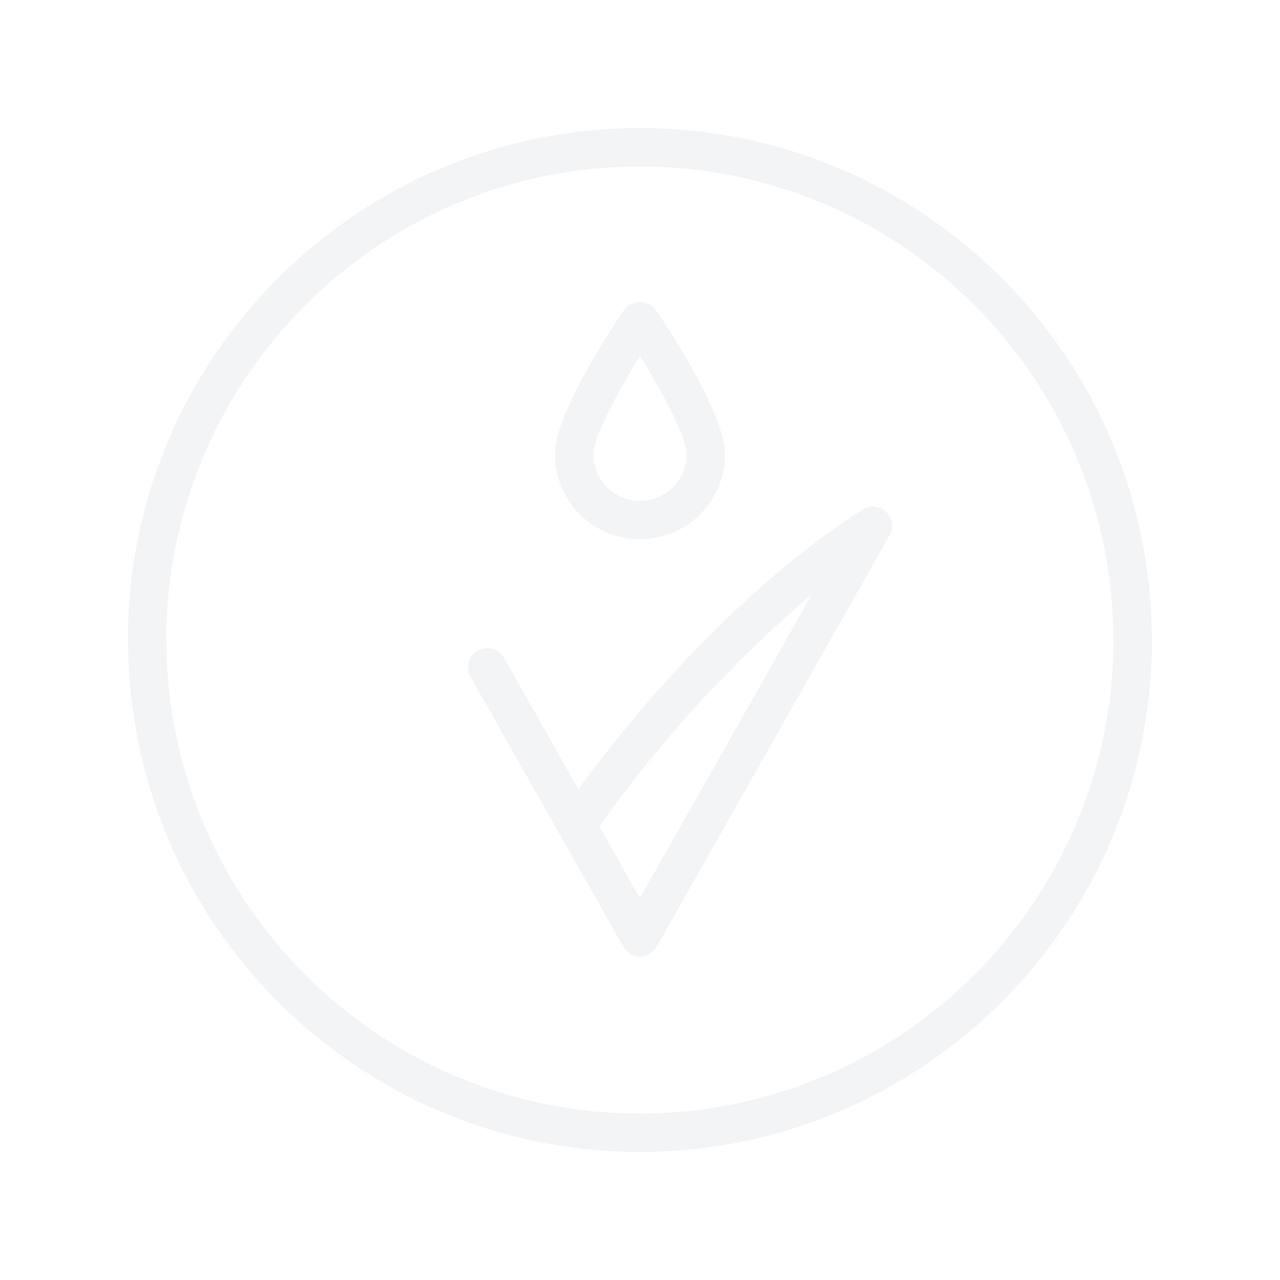 Shiseido Benefiance WrinkleResist24 Pure Retinol Express Smoothing Eye Mask 12pc